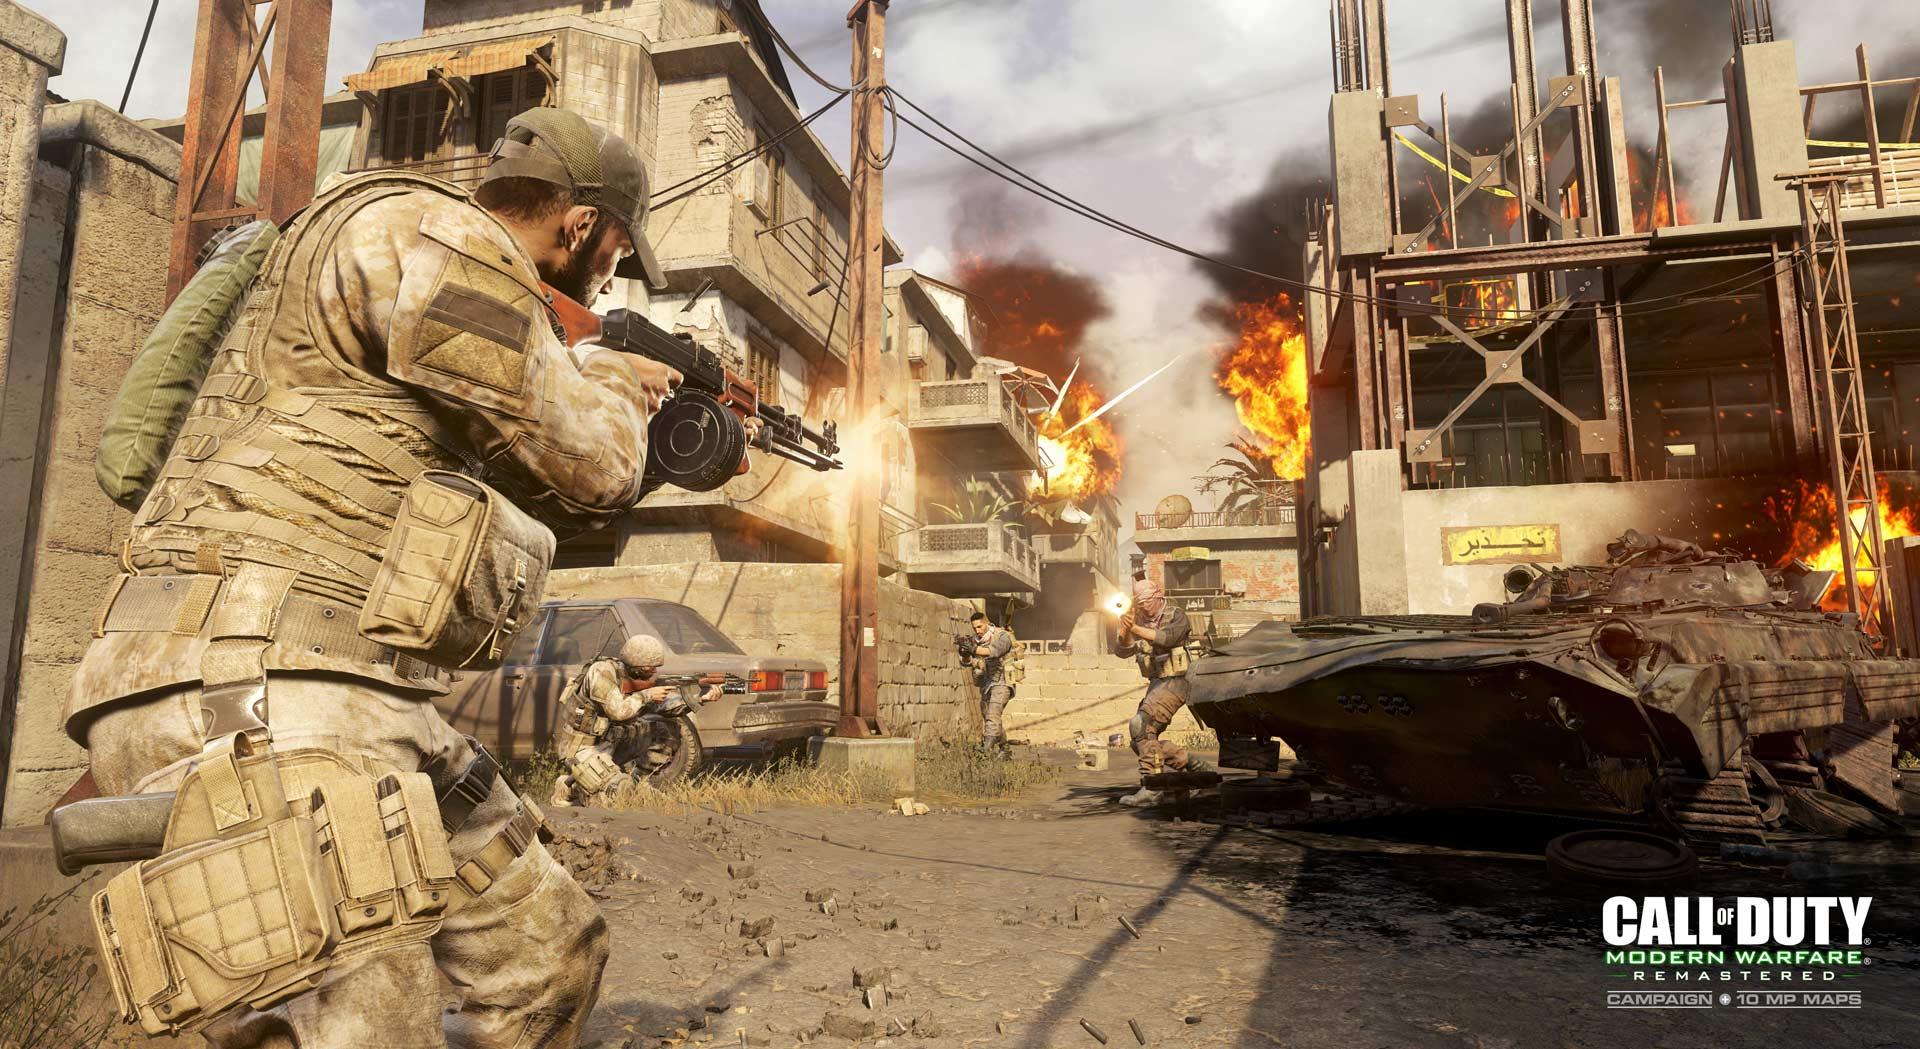 COD-Modern-Warfare-Remastered_MP_Backlot-1_WM